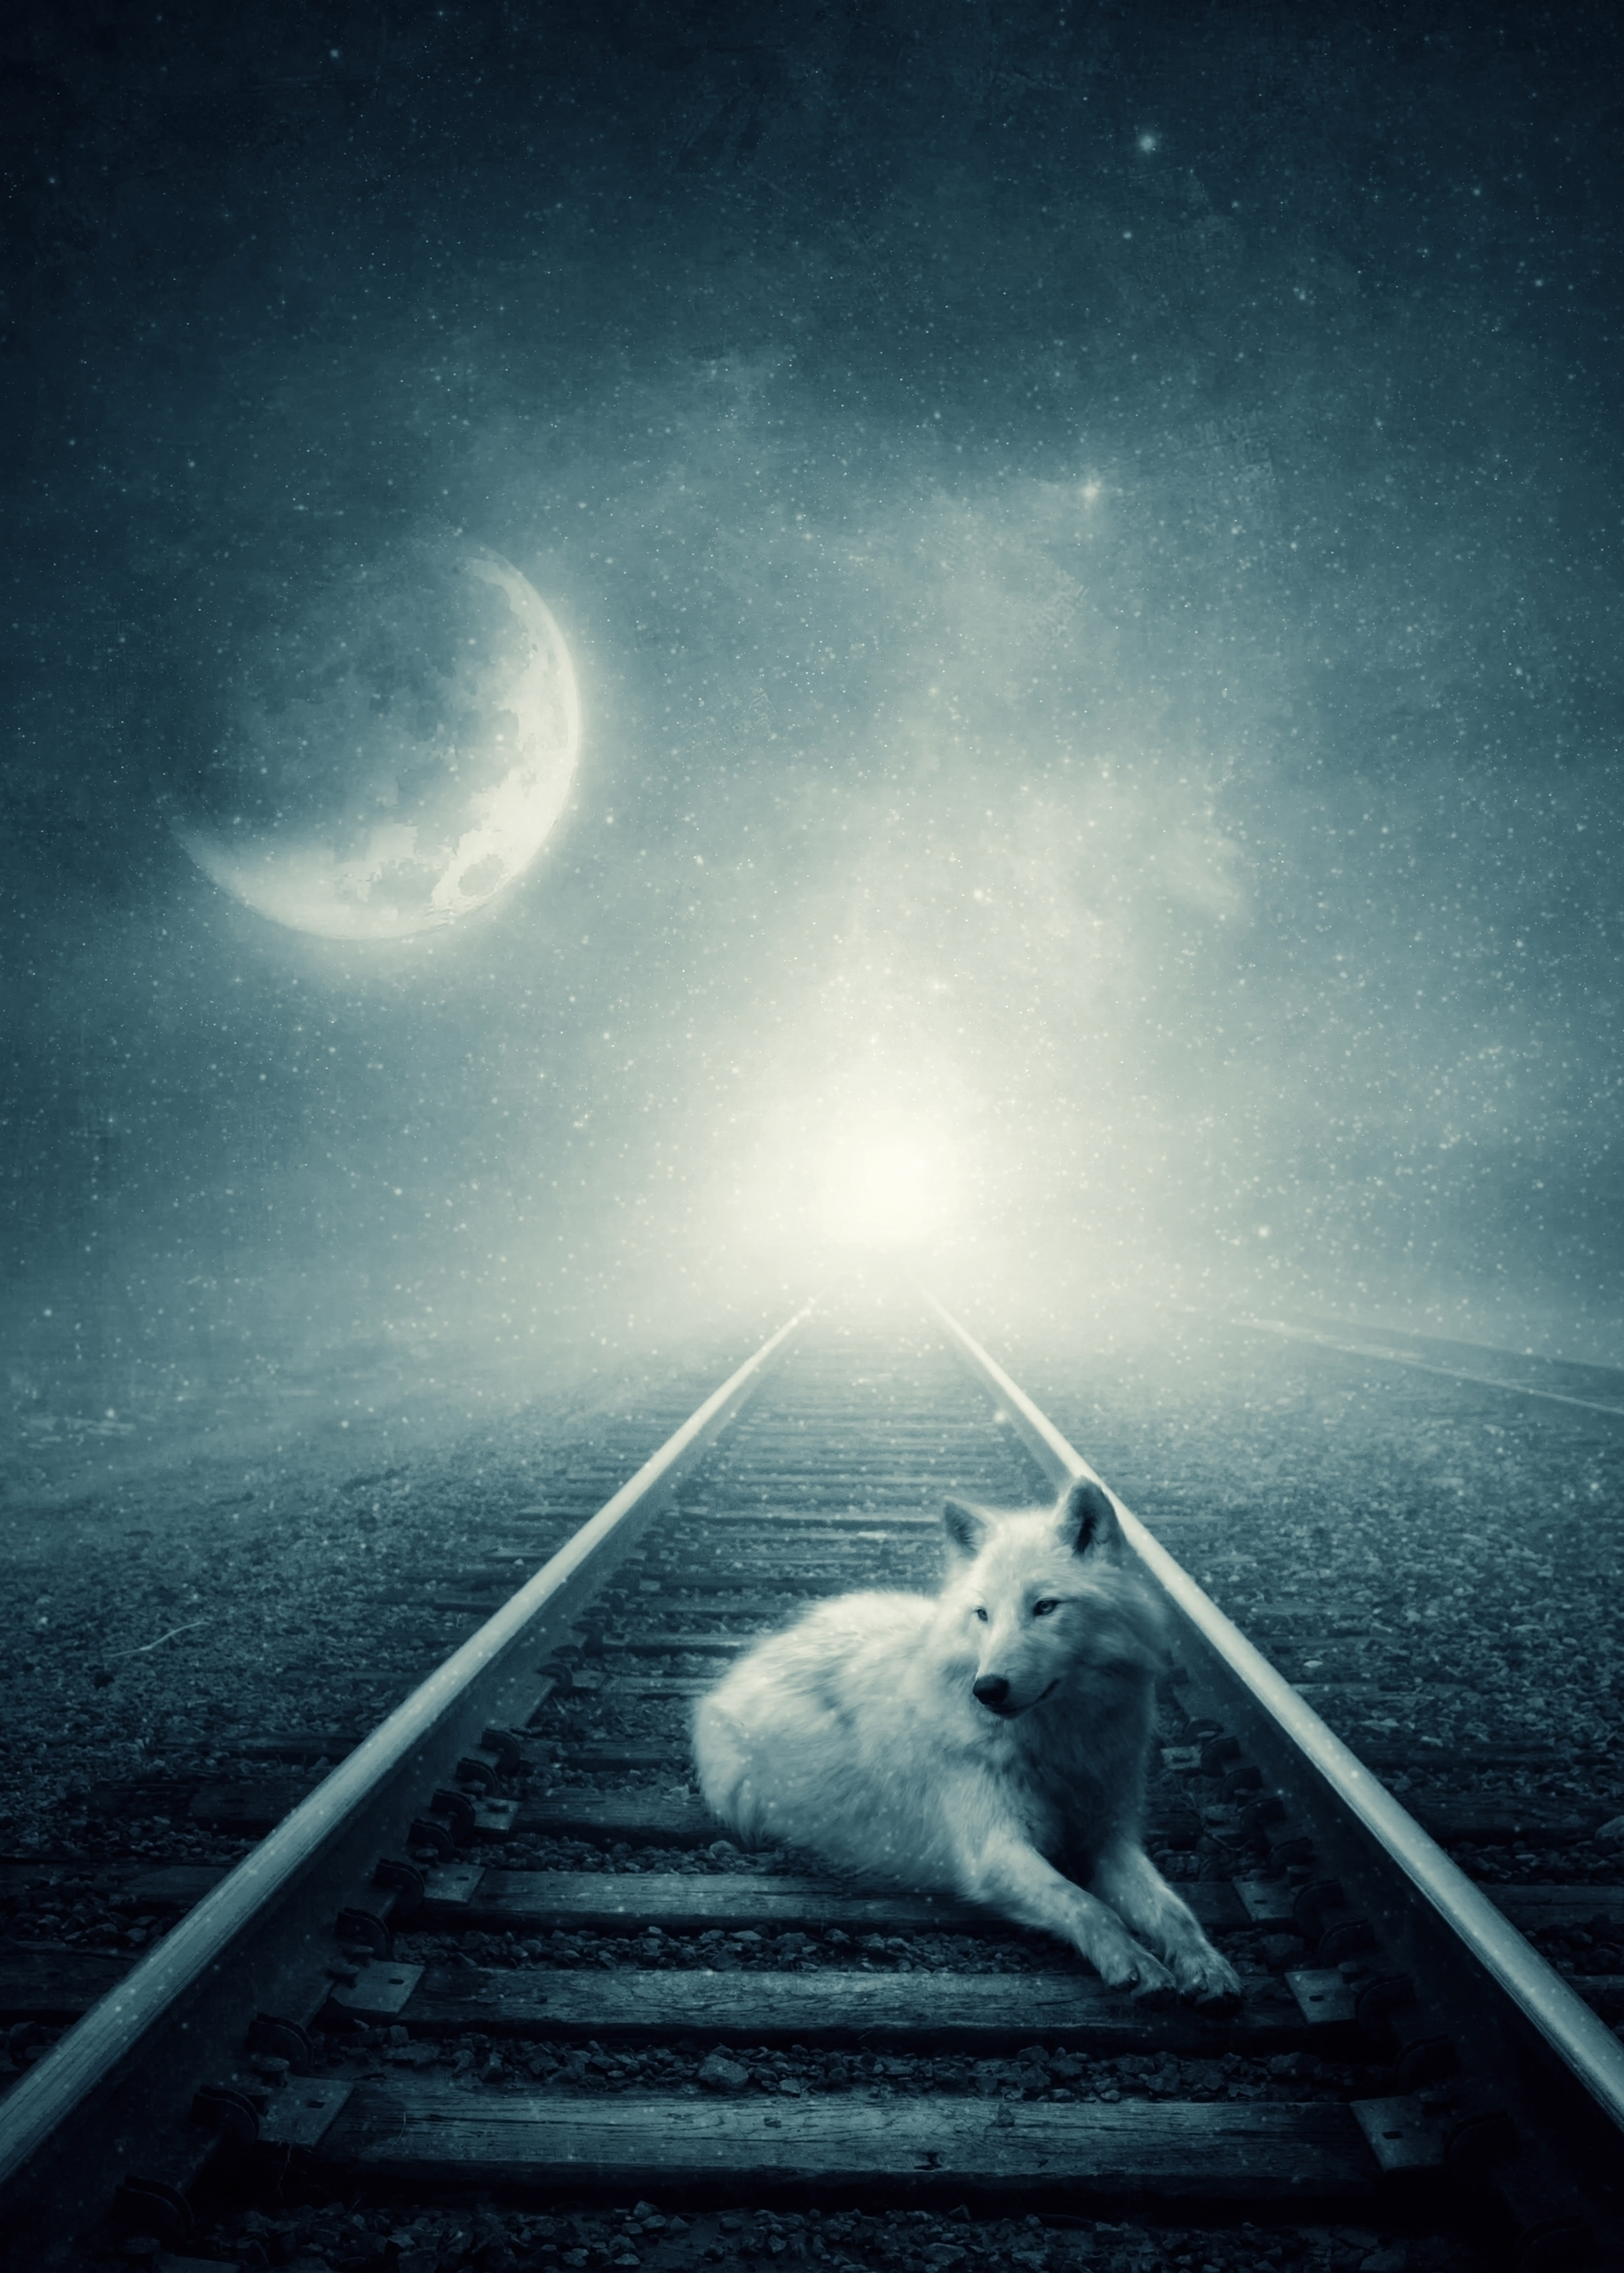 Moon Stories Albulena Panduri S - albulena   ello